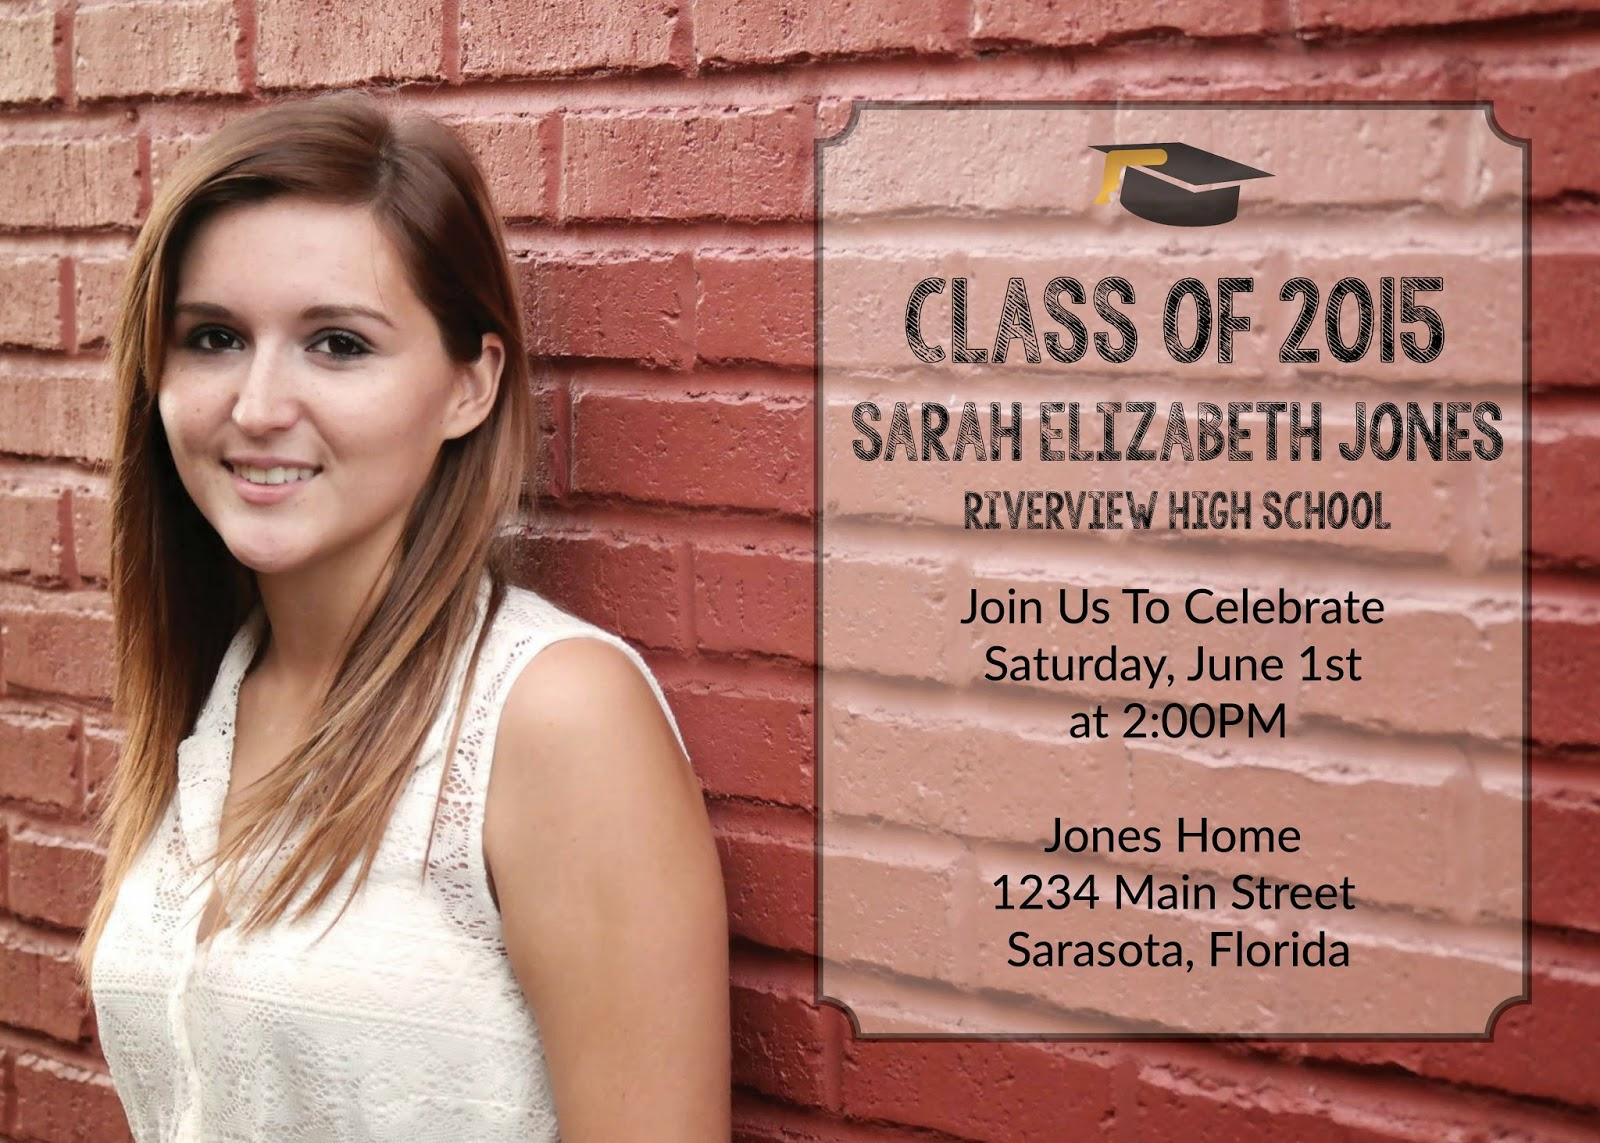 Class of 2015 Graduation Announcement